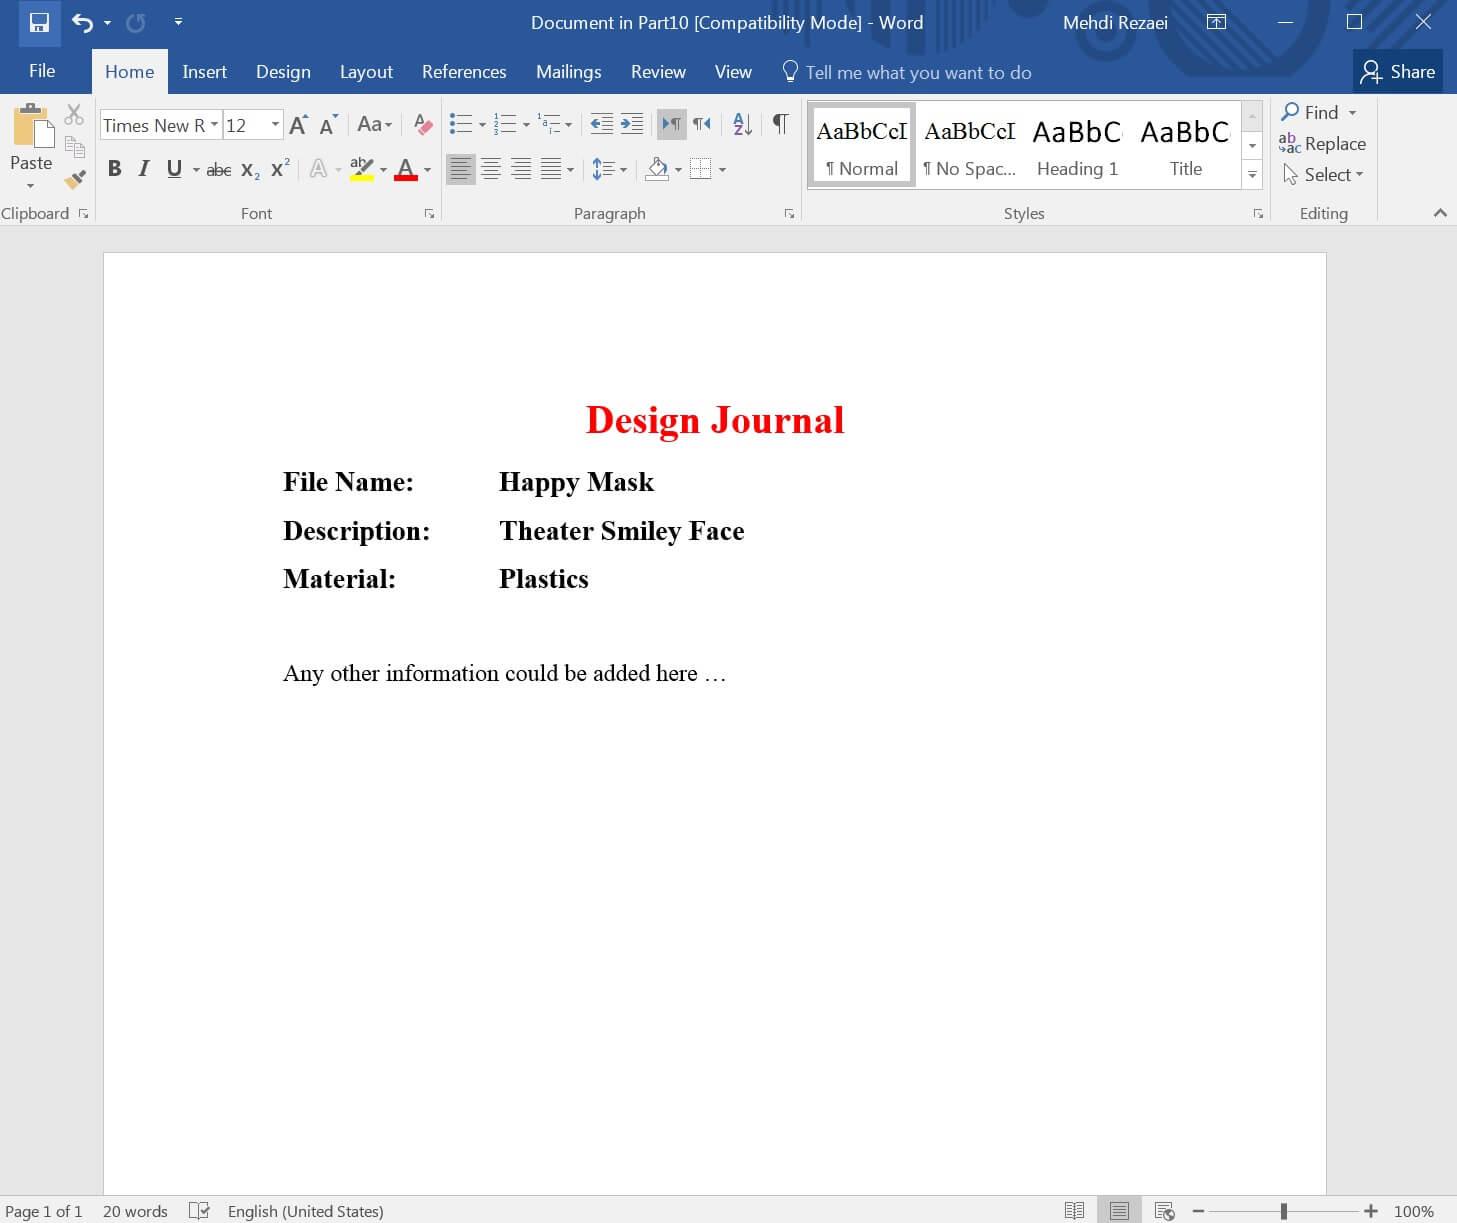 Design Journal Added info